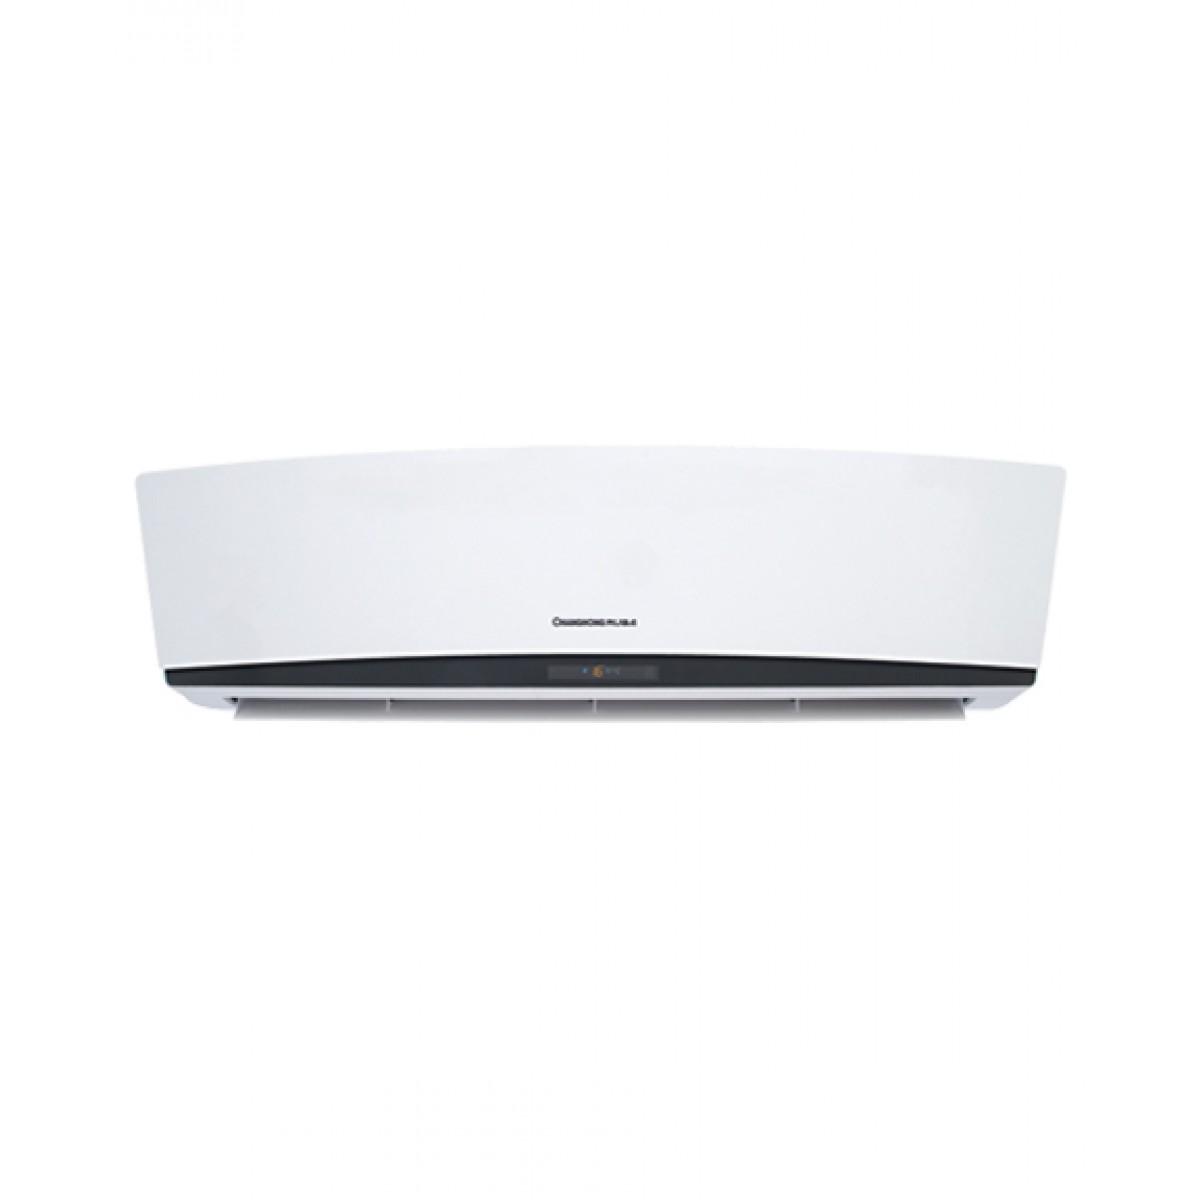 Air Conditioners CHANGHONG RUBA SPLIT AIR CONDITIONER 1.0 TON (CSC #74614D